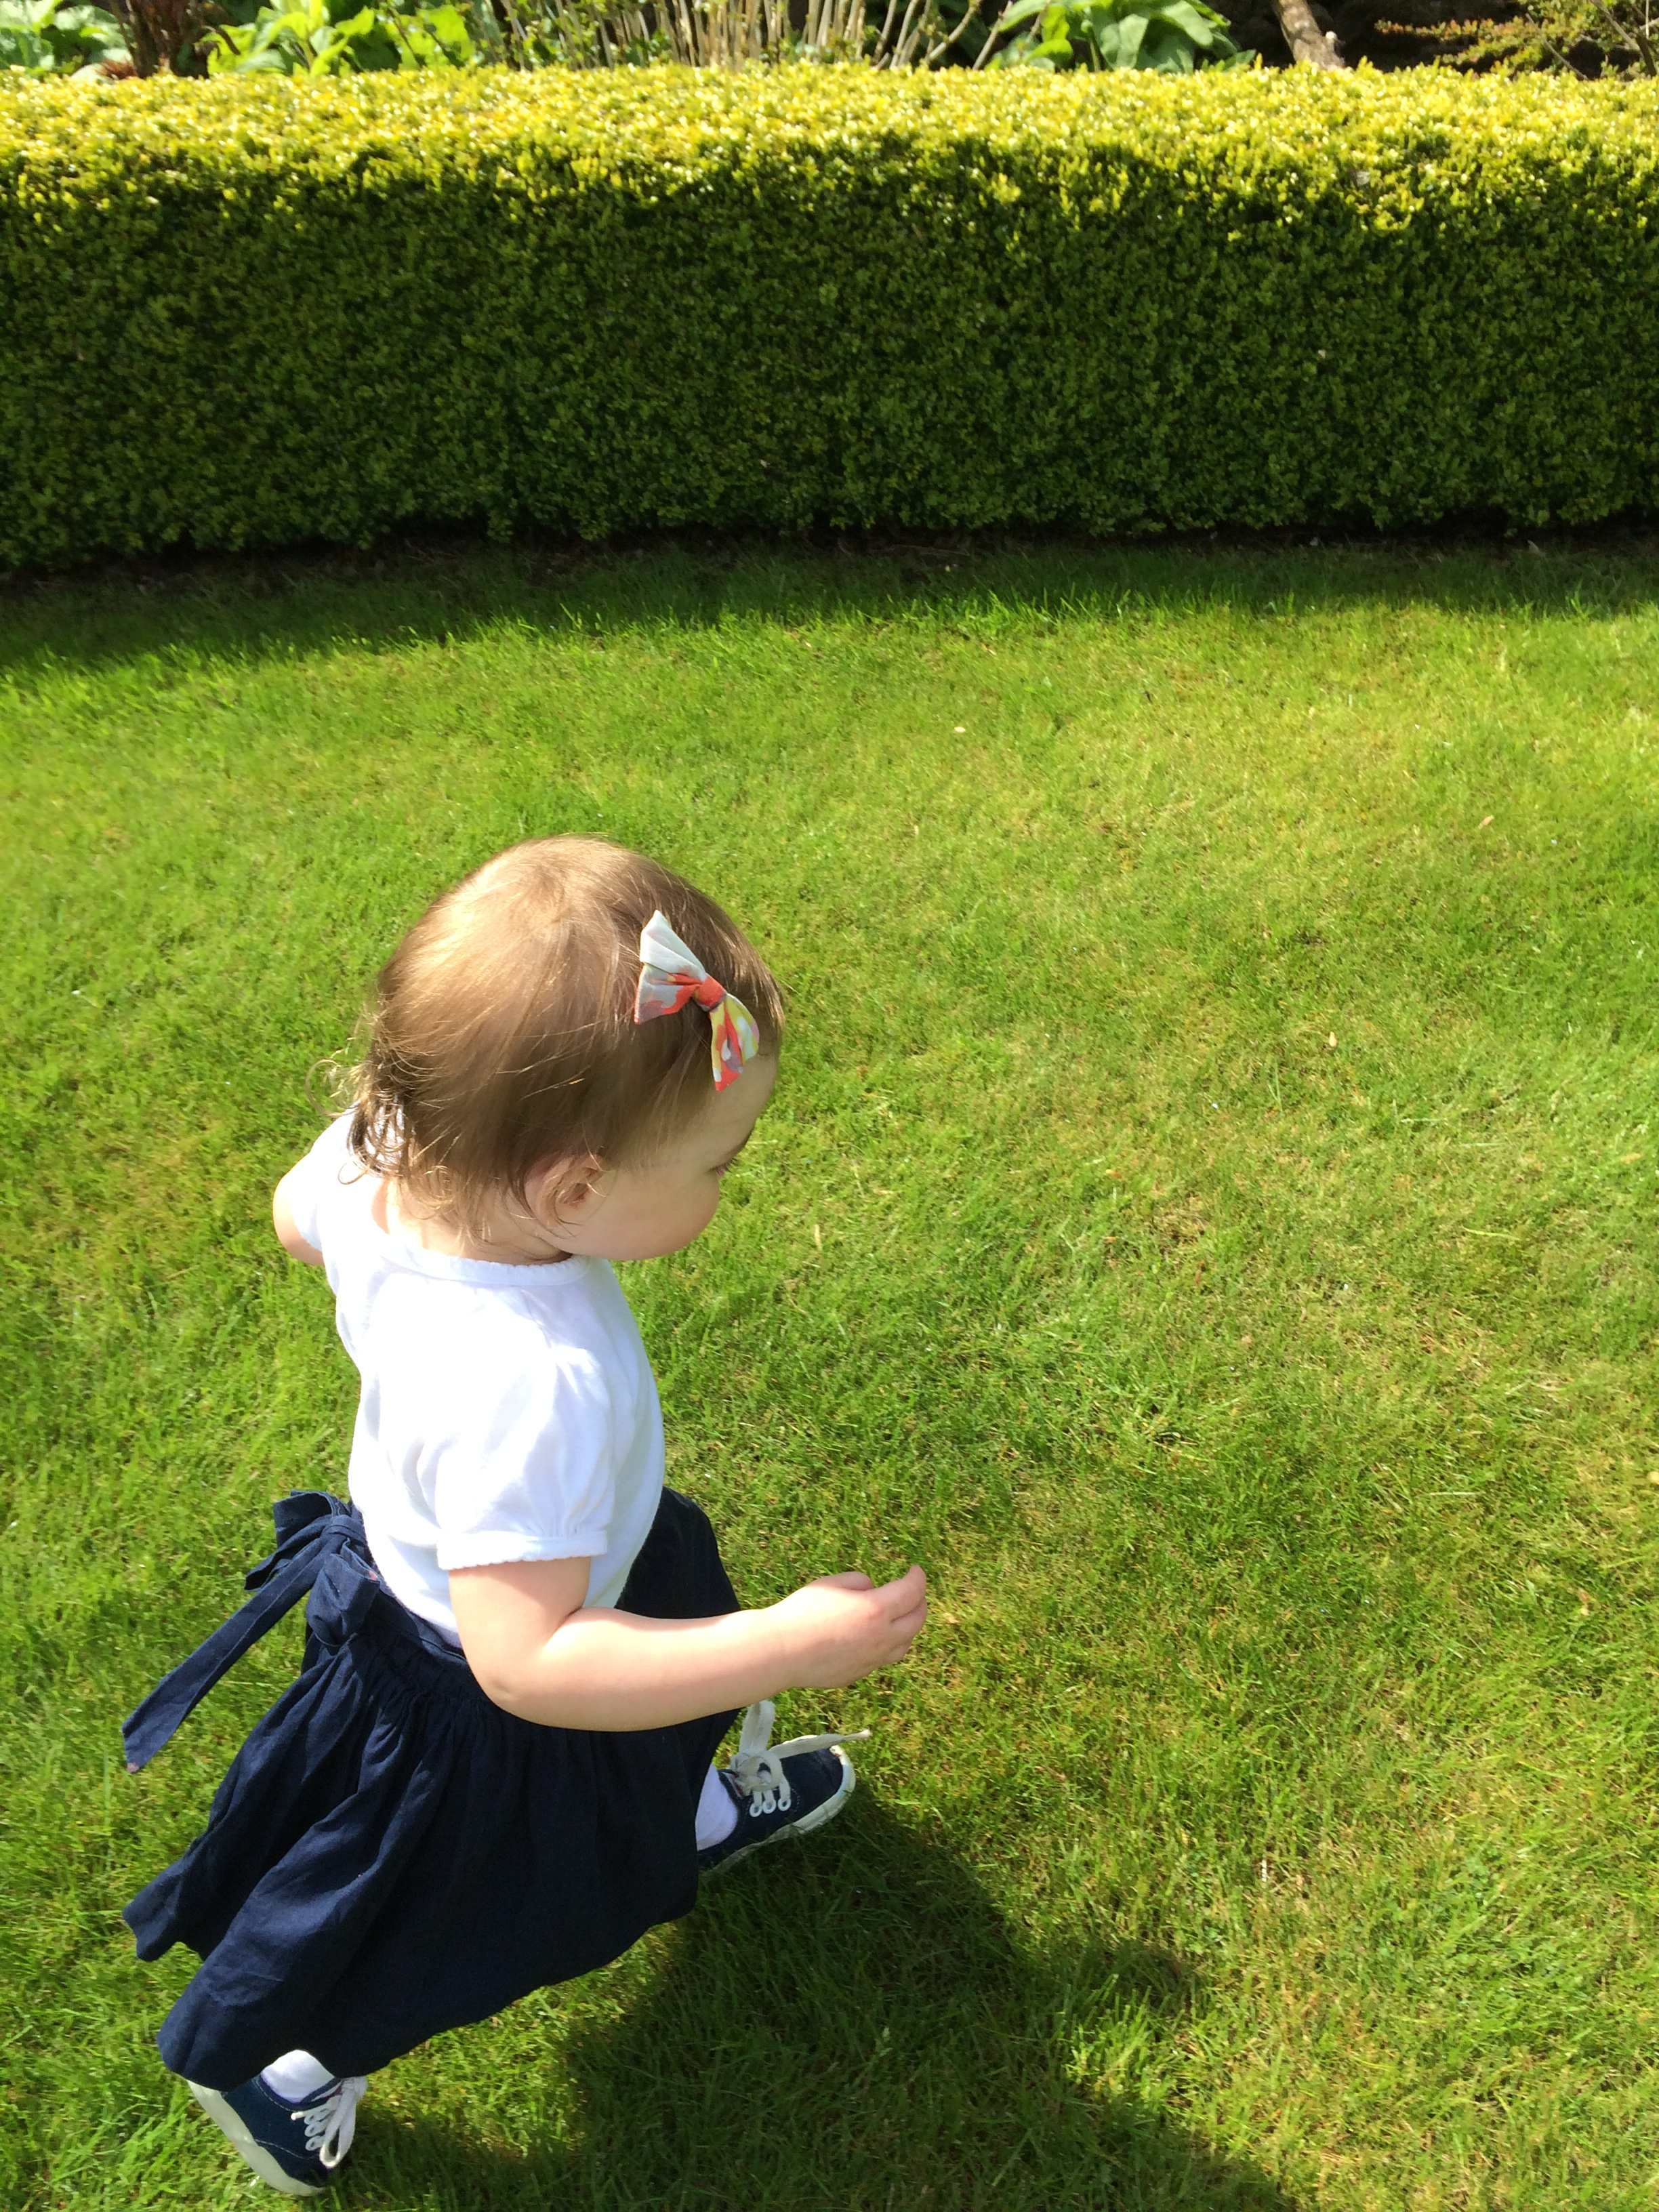 irish-green-grass-run.jpg